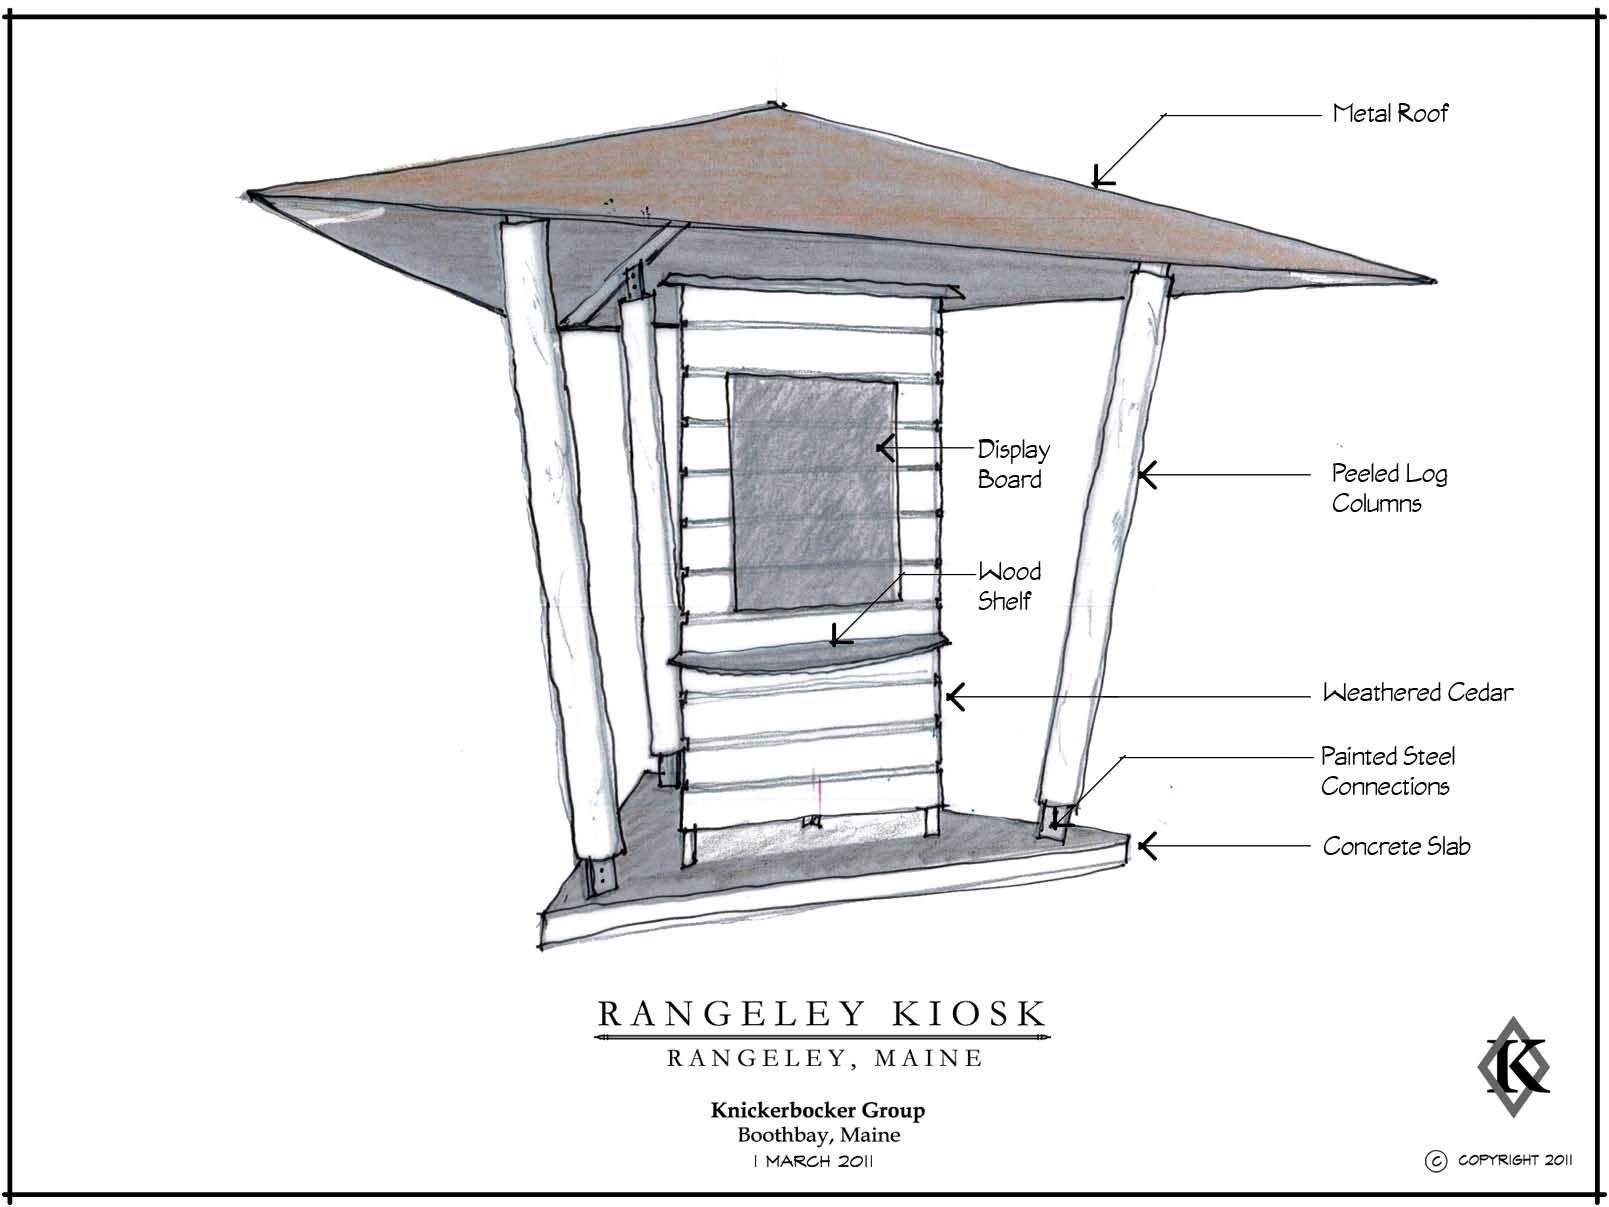 Kiosk design images background hd 2 architecture for Garden kiosk designs